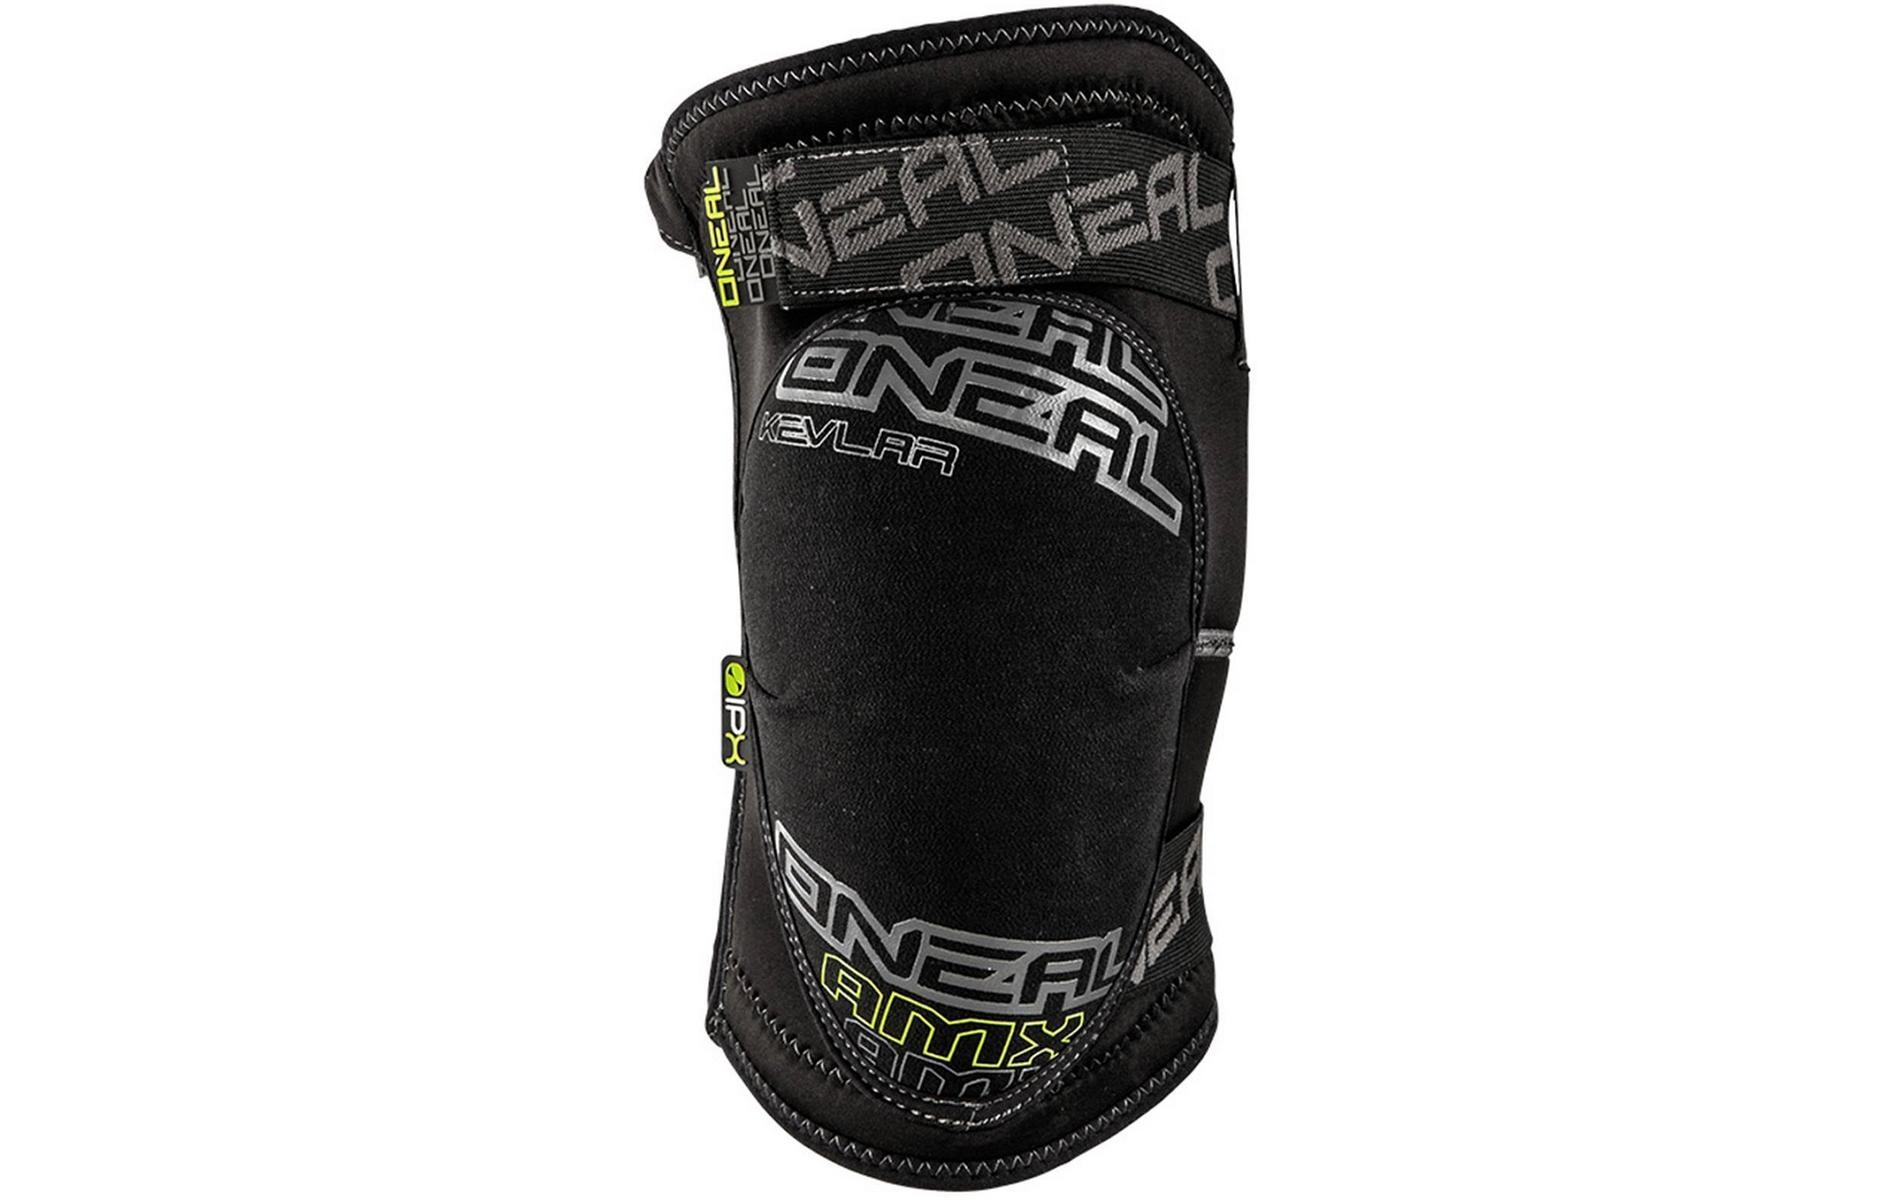 O'Neal Amx Zipper Knee Guard, S